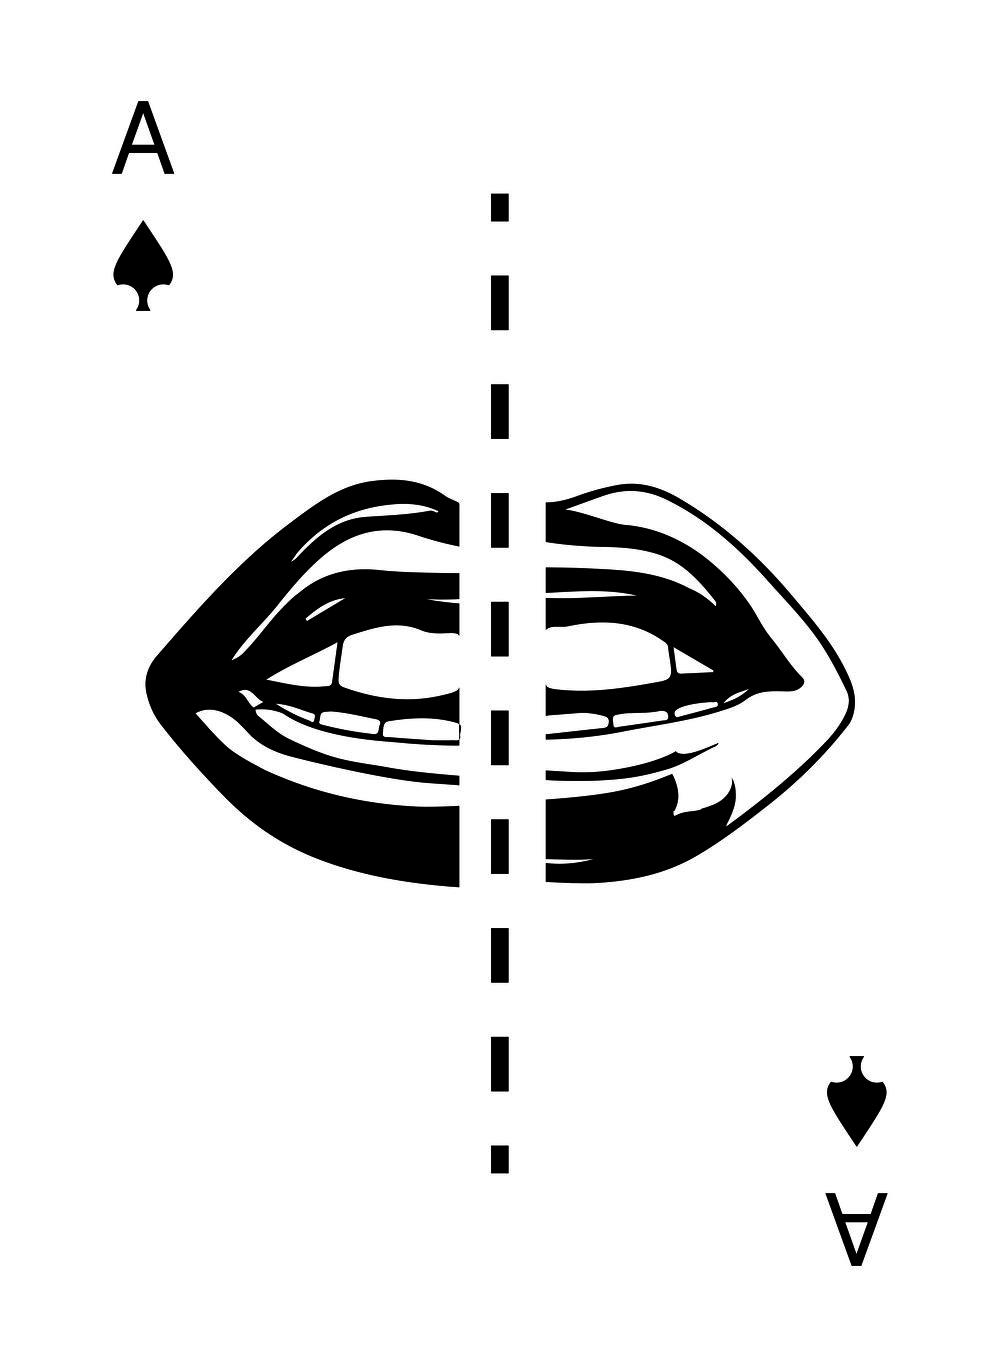 52_2__0012_Spades_Ace.jpg